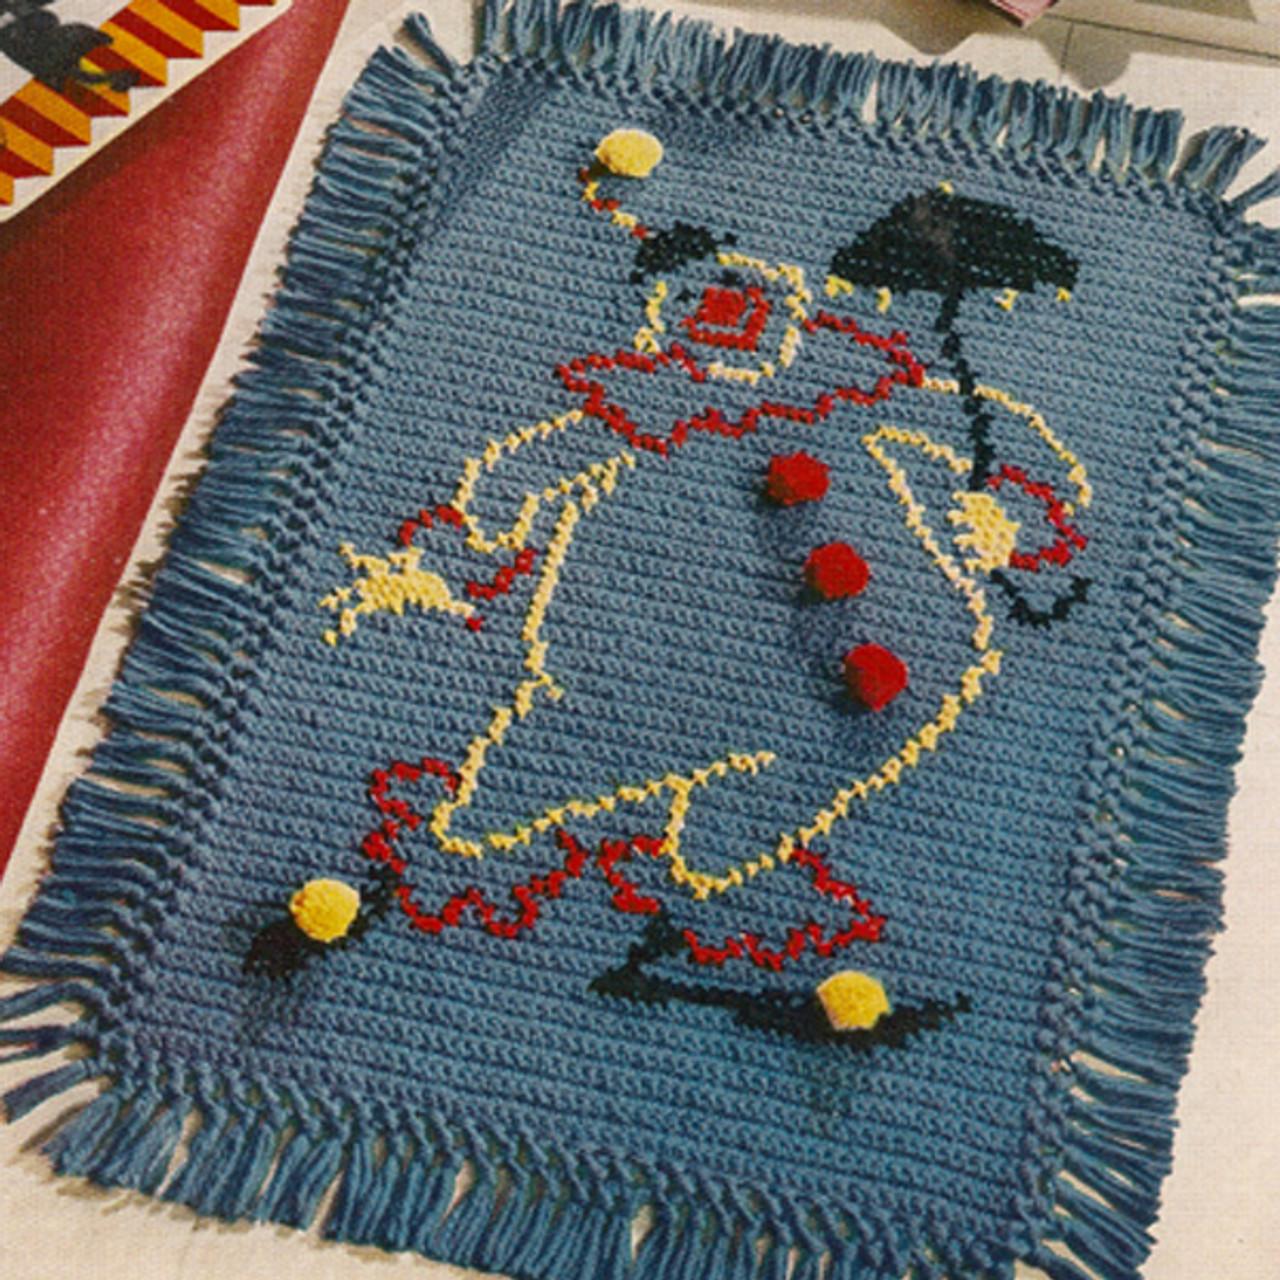 Childs Clown Crochet Rug Pattern